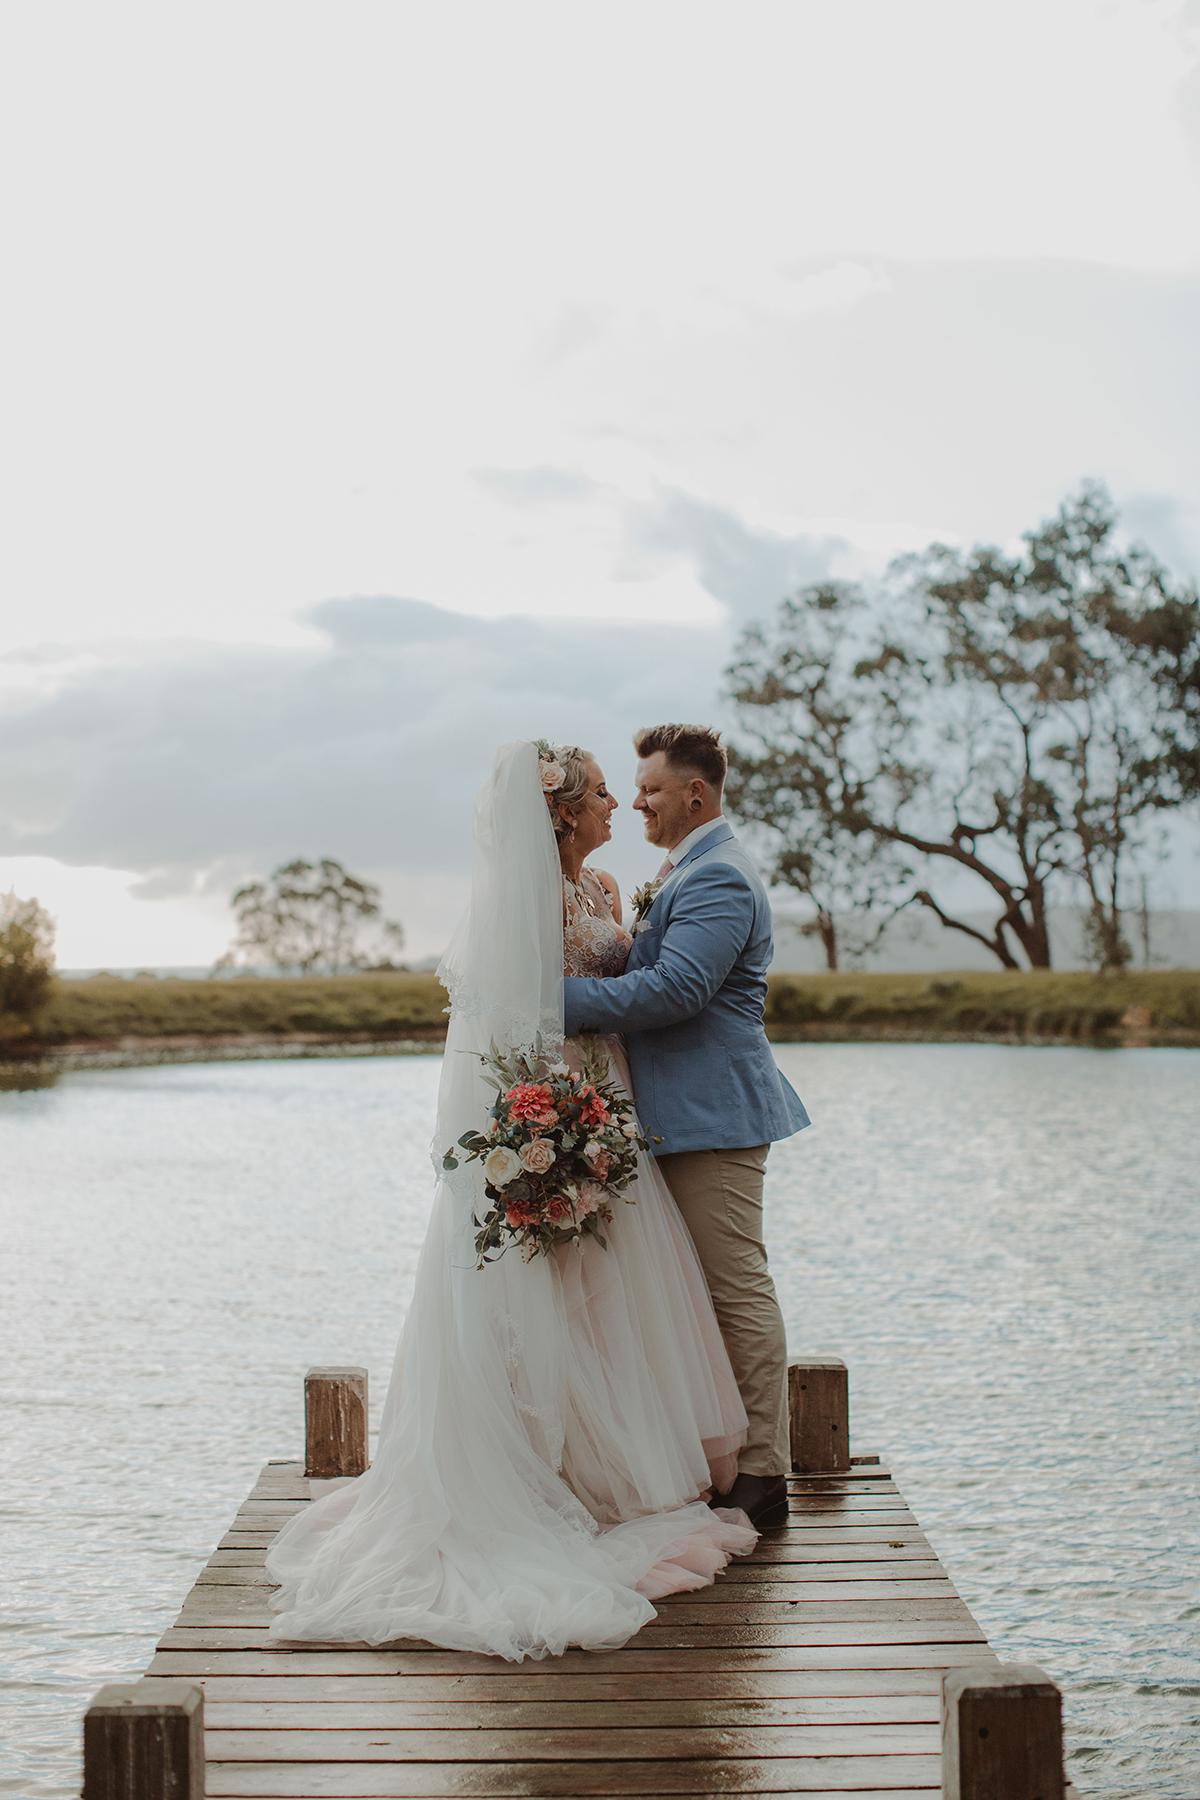 Eclectic Rustic Wedding At Tanglewood Estate Polka Dot Wedding